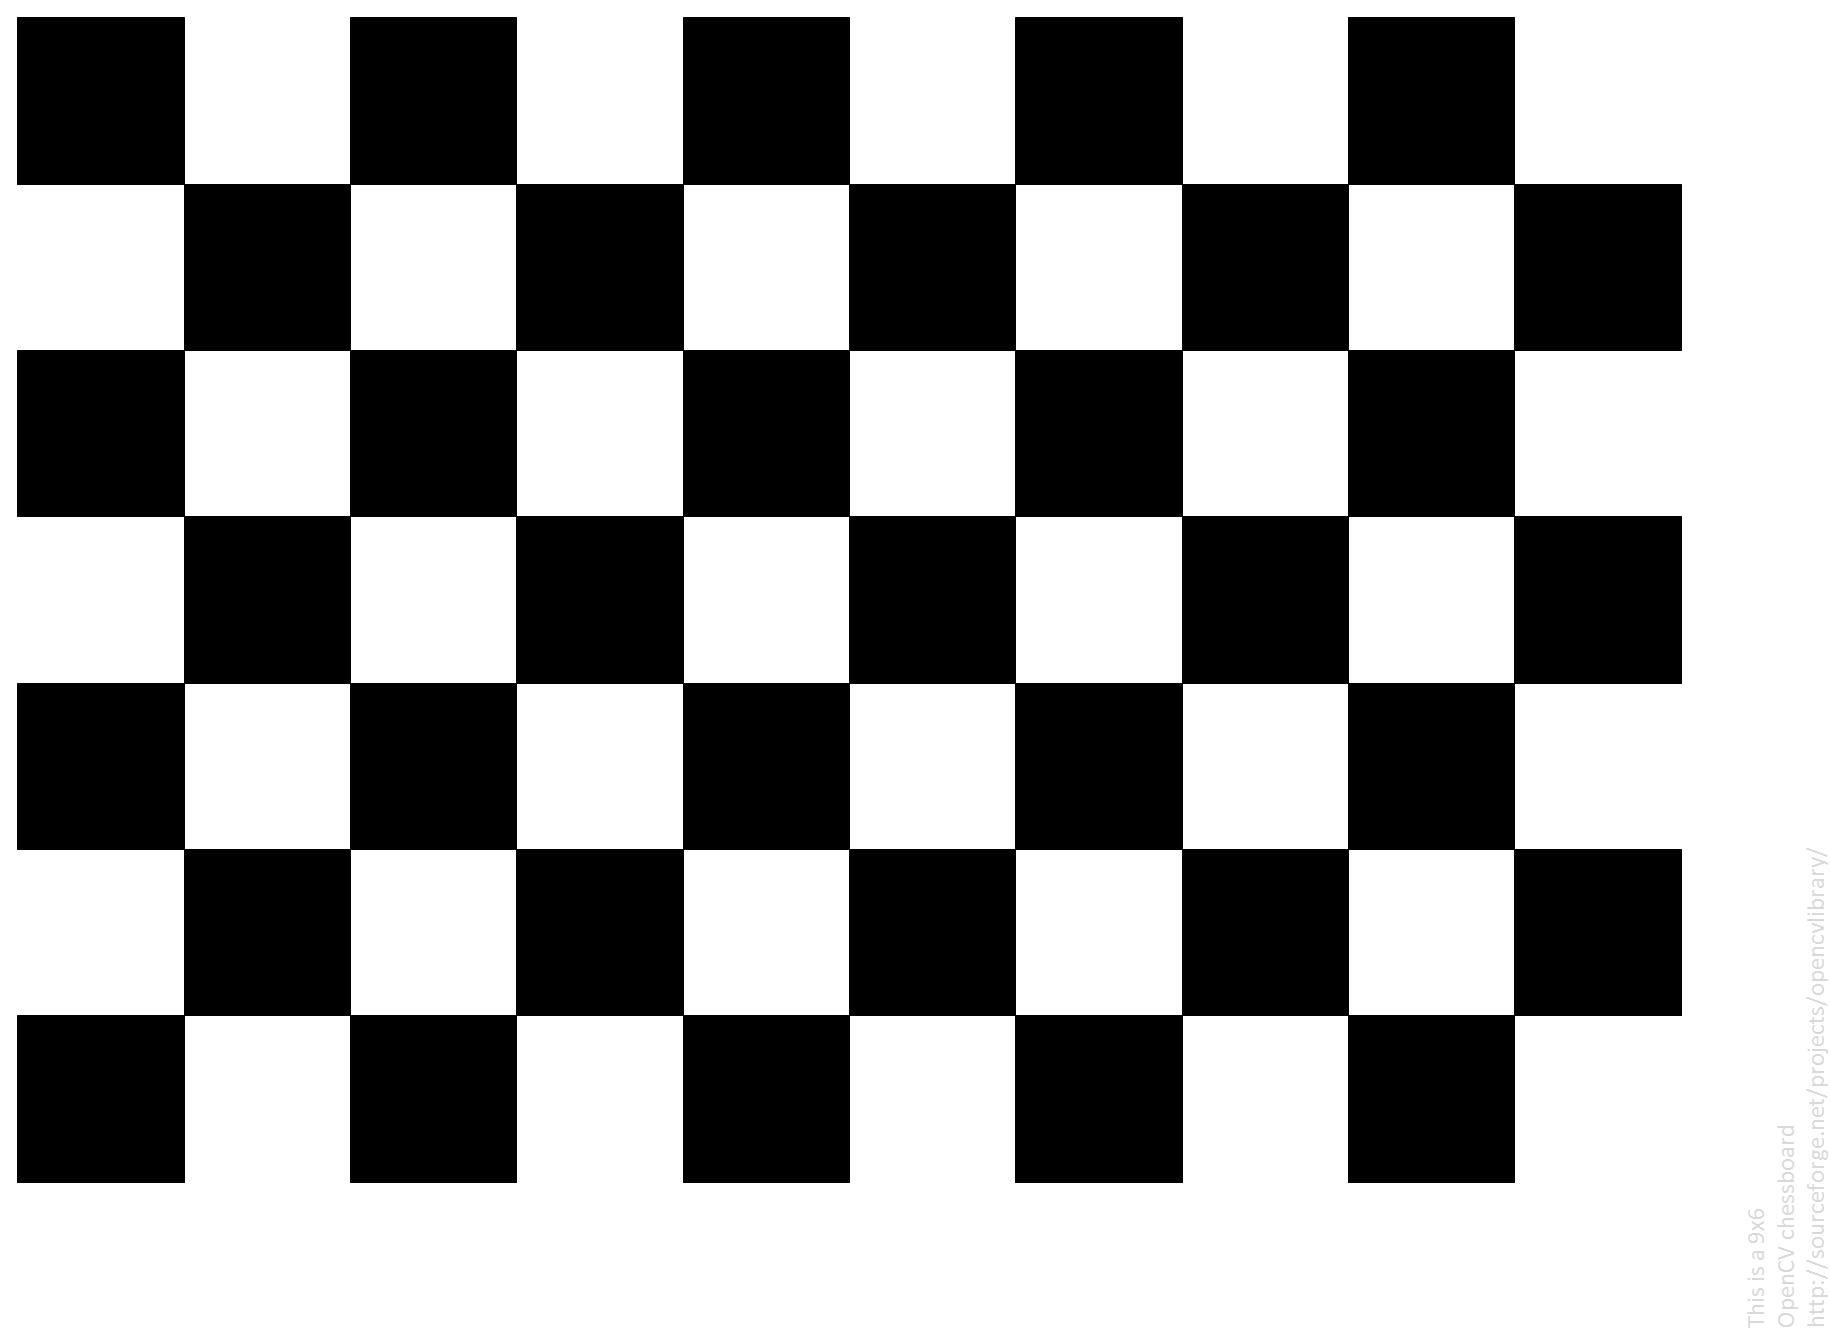 6 x 9 chessboard